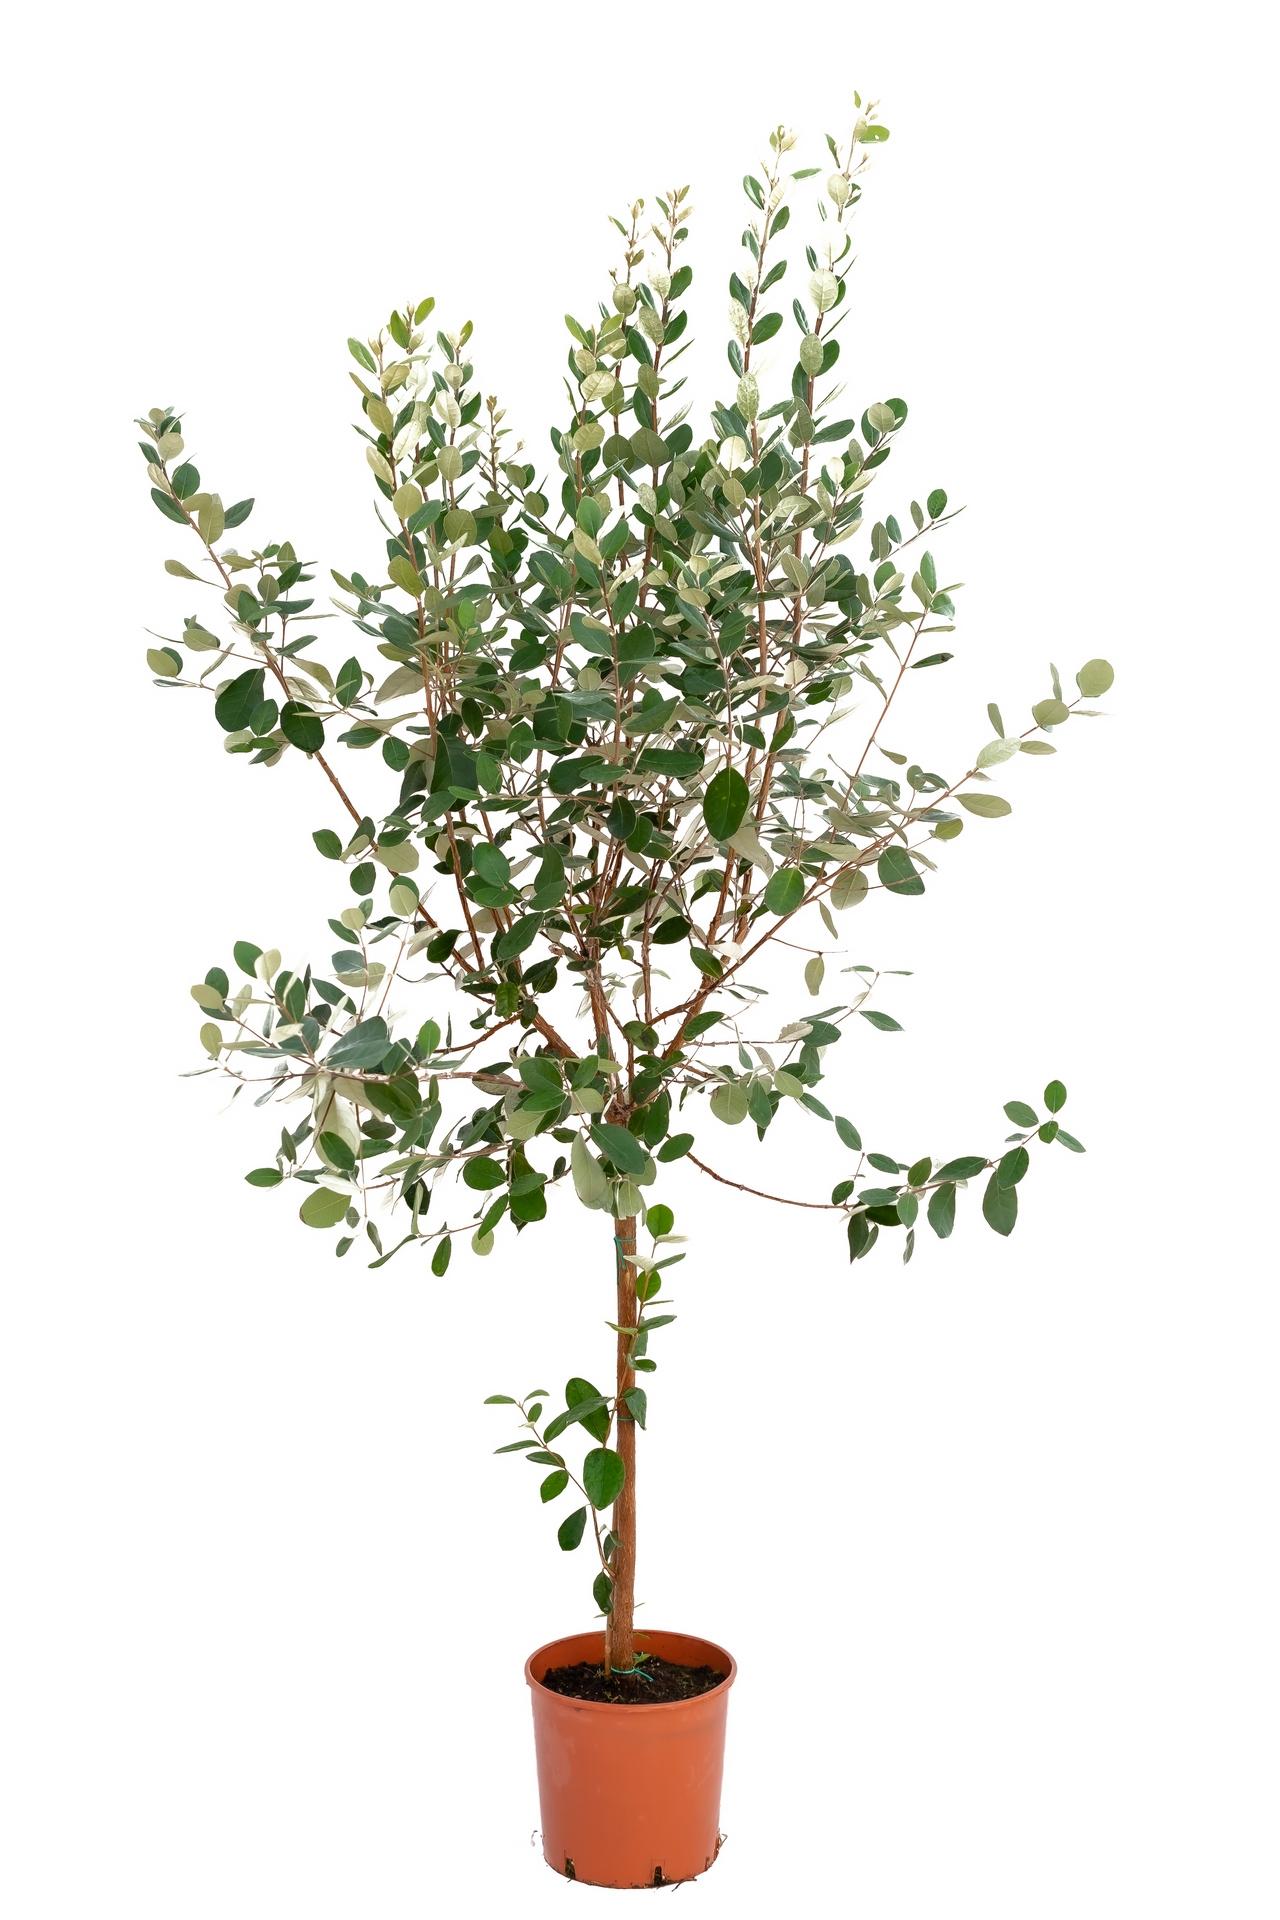 Image of Akka sellowa duże drzewko